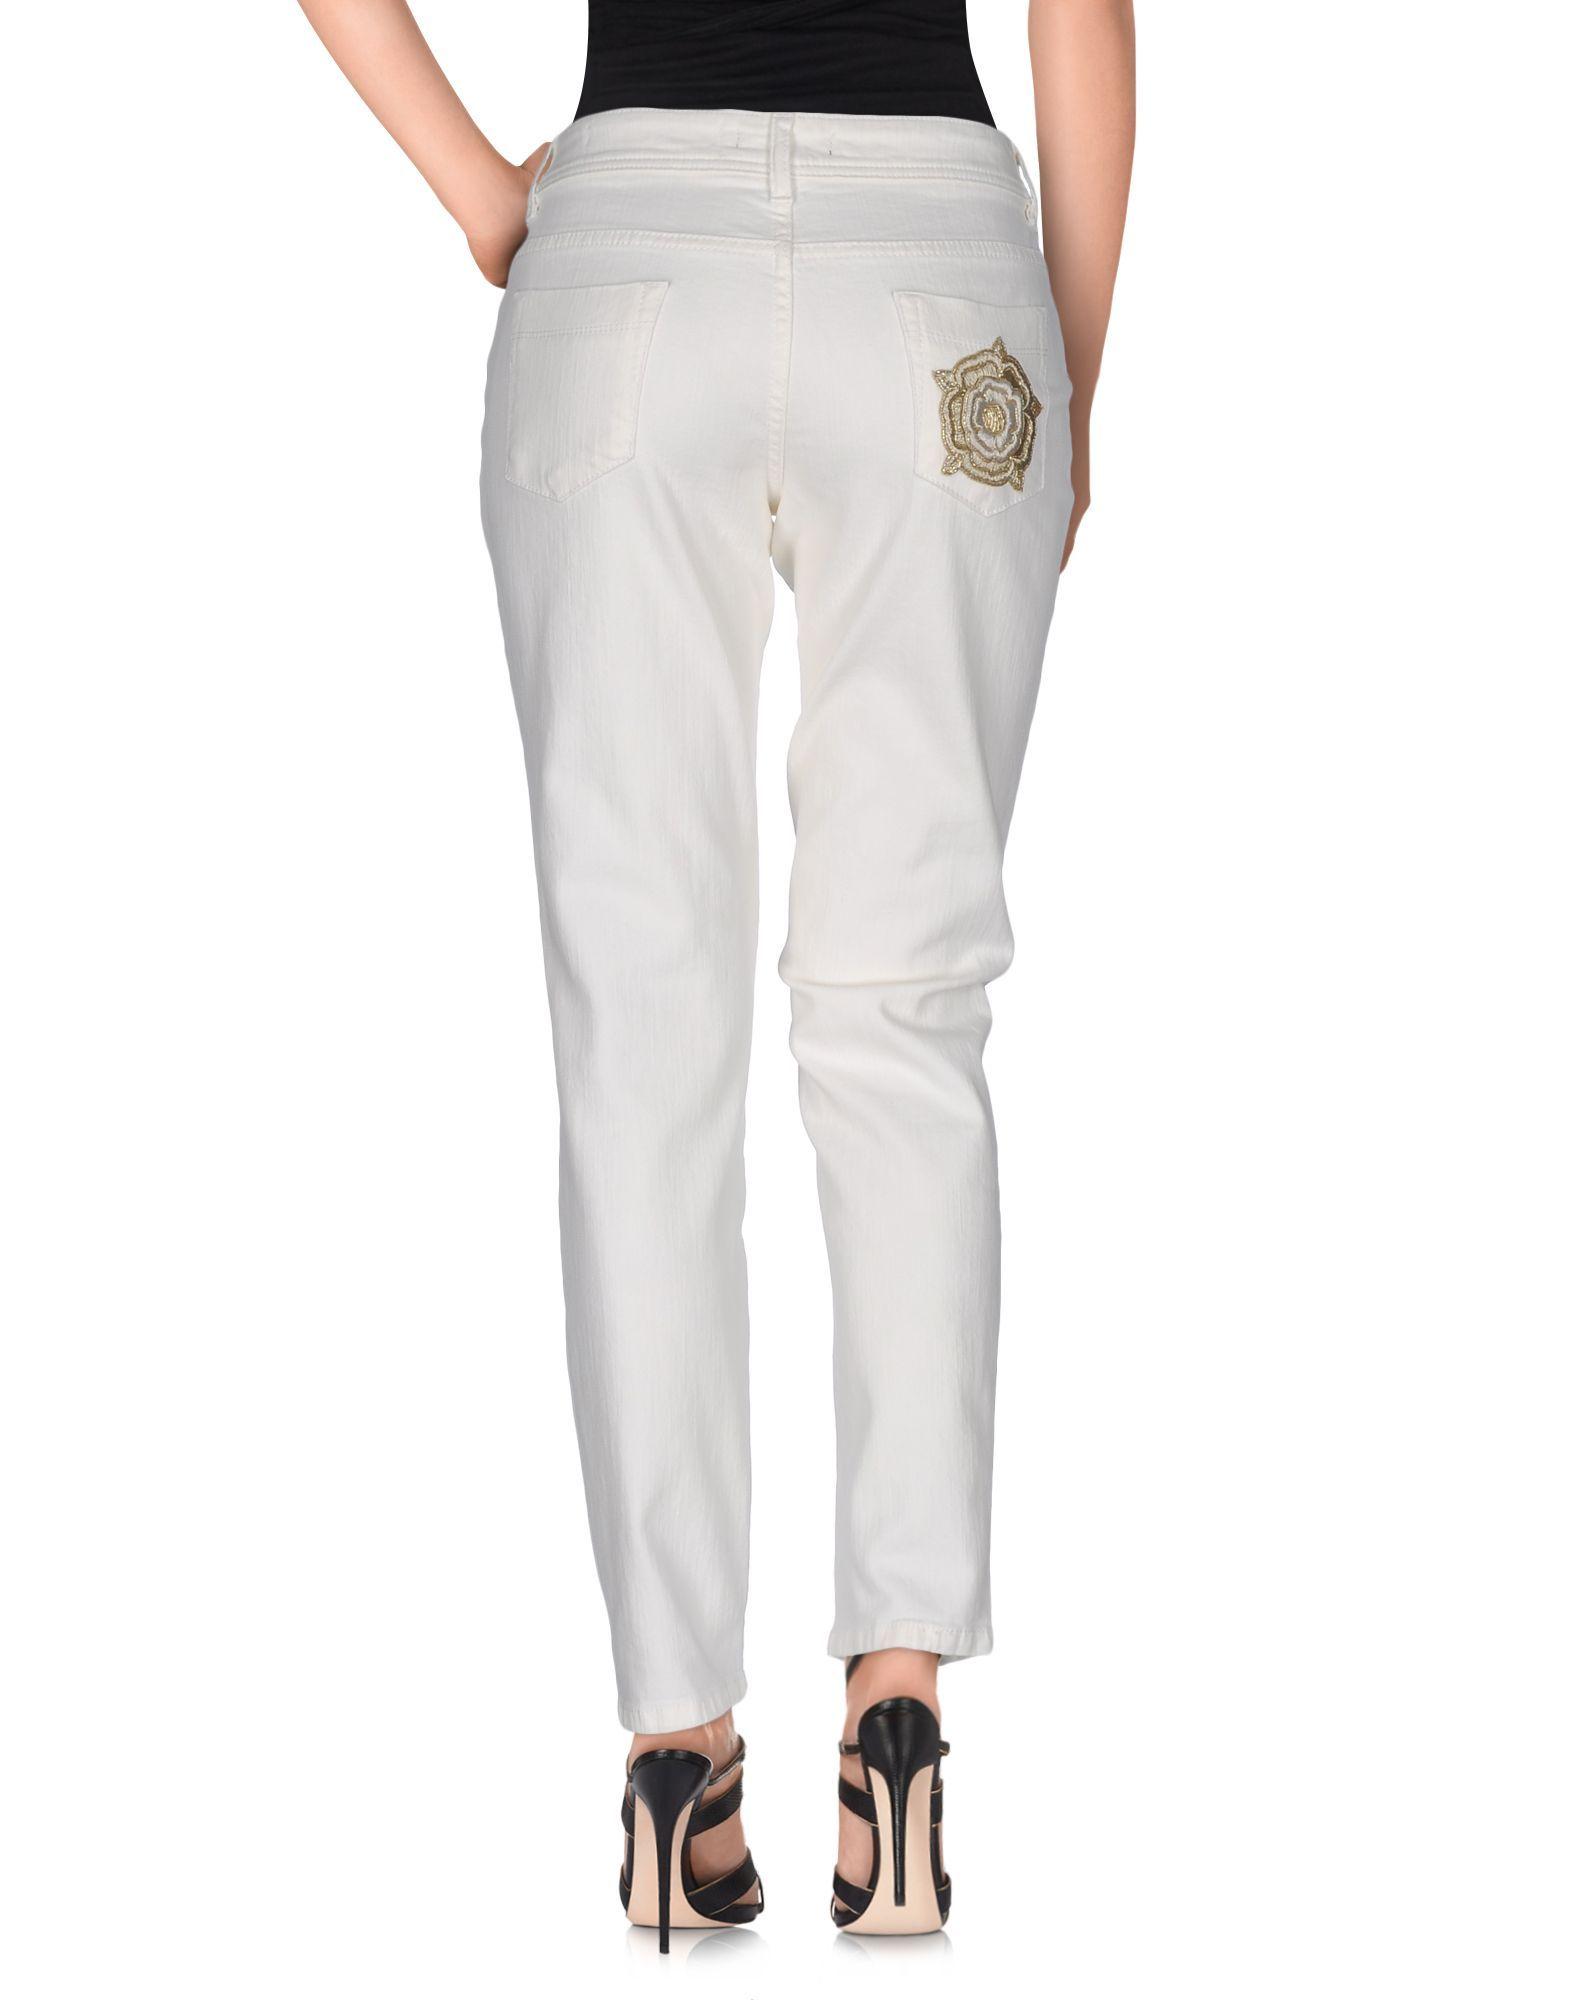 DENIM Just Cavalli White Woman Cotton